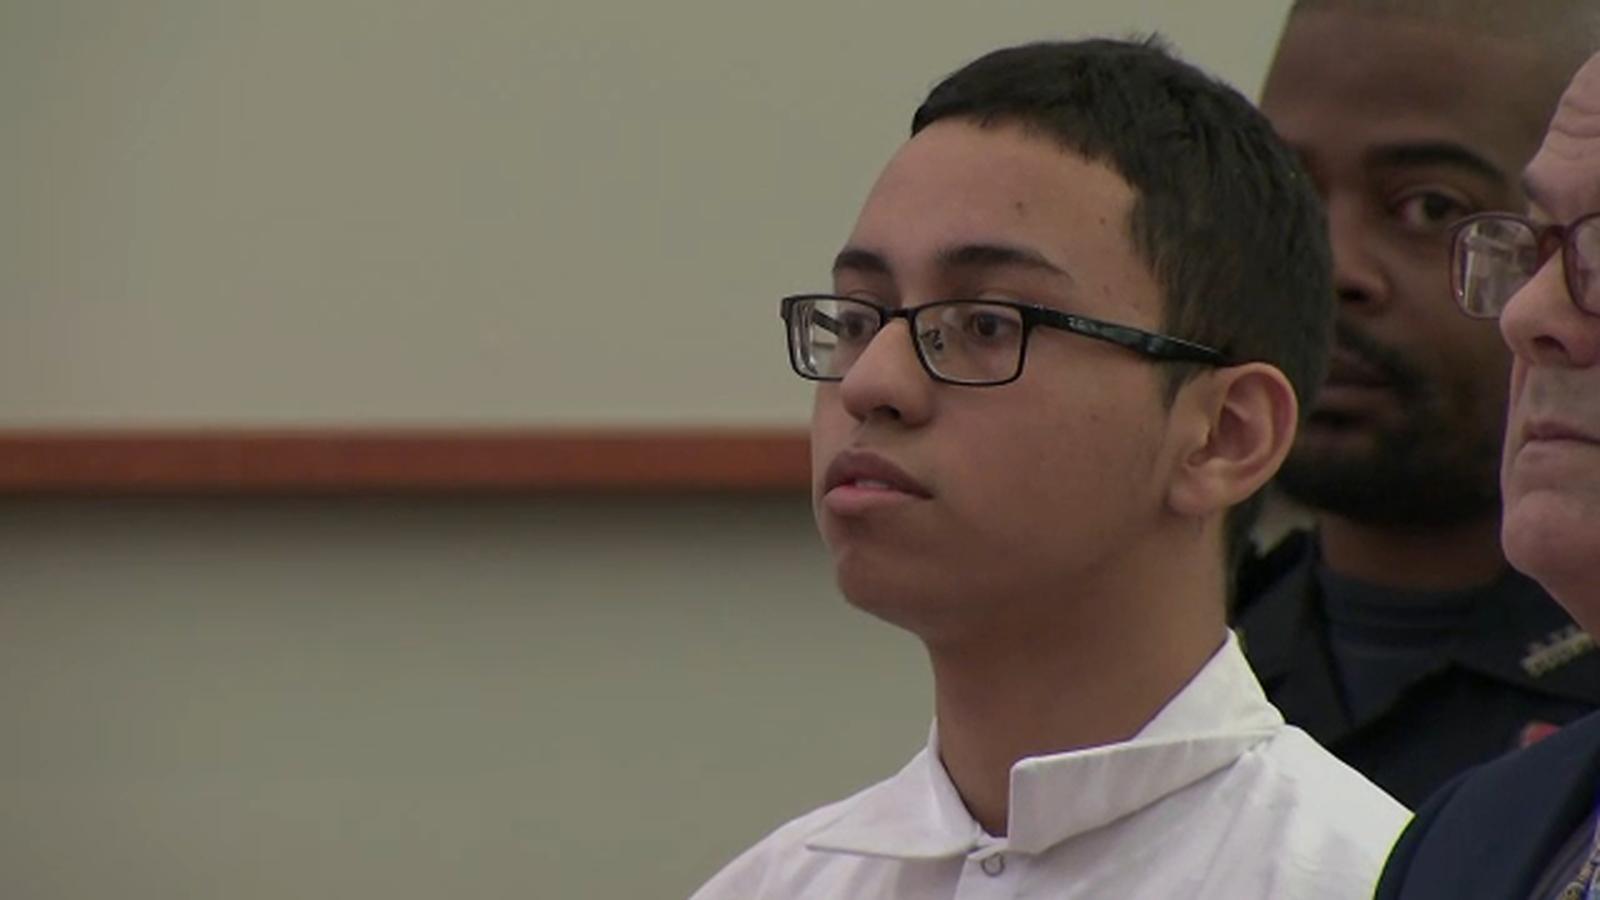 Trial begins for suspect in fatal Bronx school stabbing